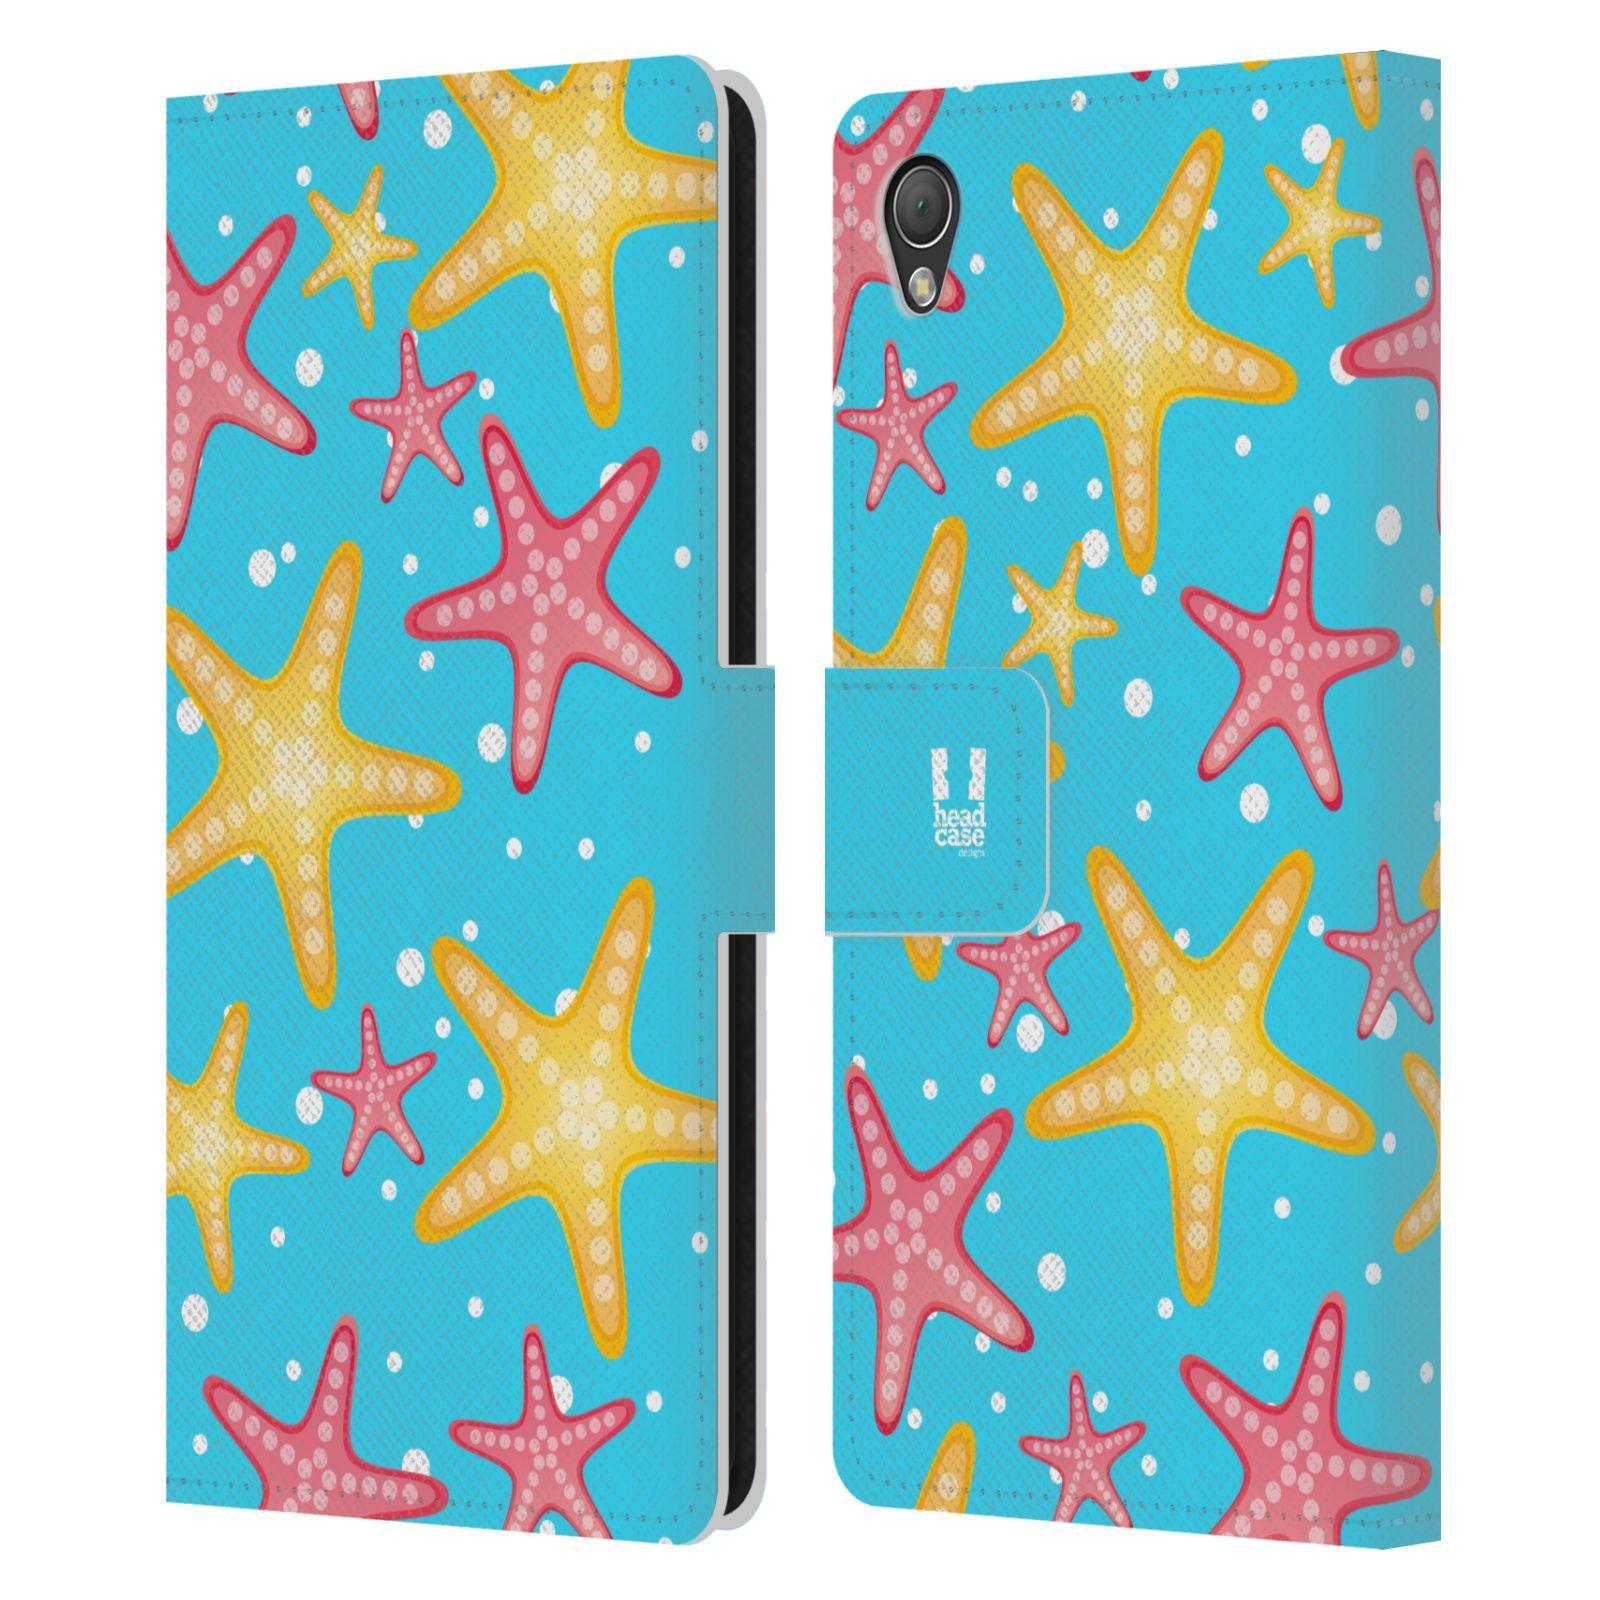 HEAD CASE Flipové pouzdro pro mobil SONY XPERIA Z3 Mořský živočich hvězdice modrá barva pozadí